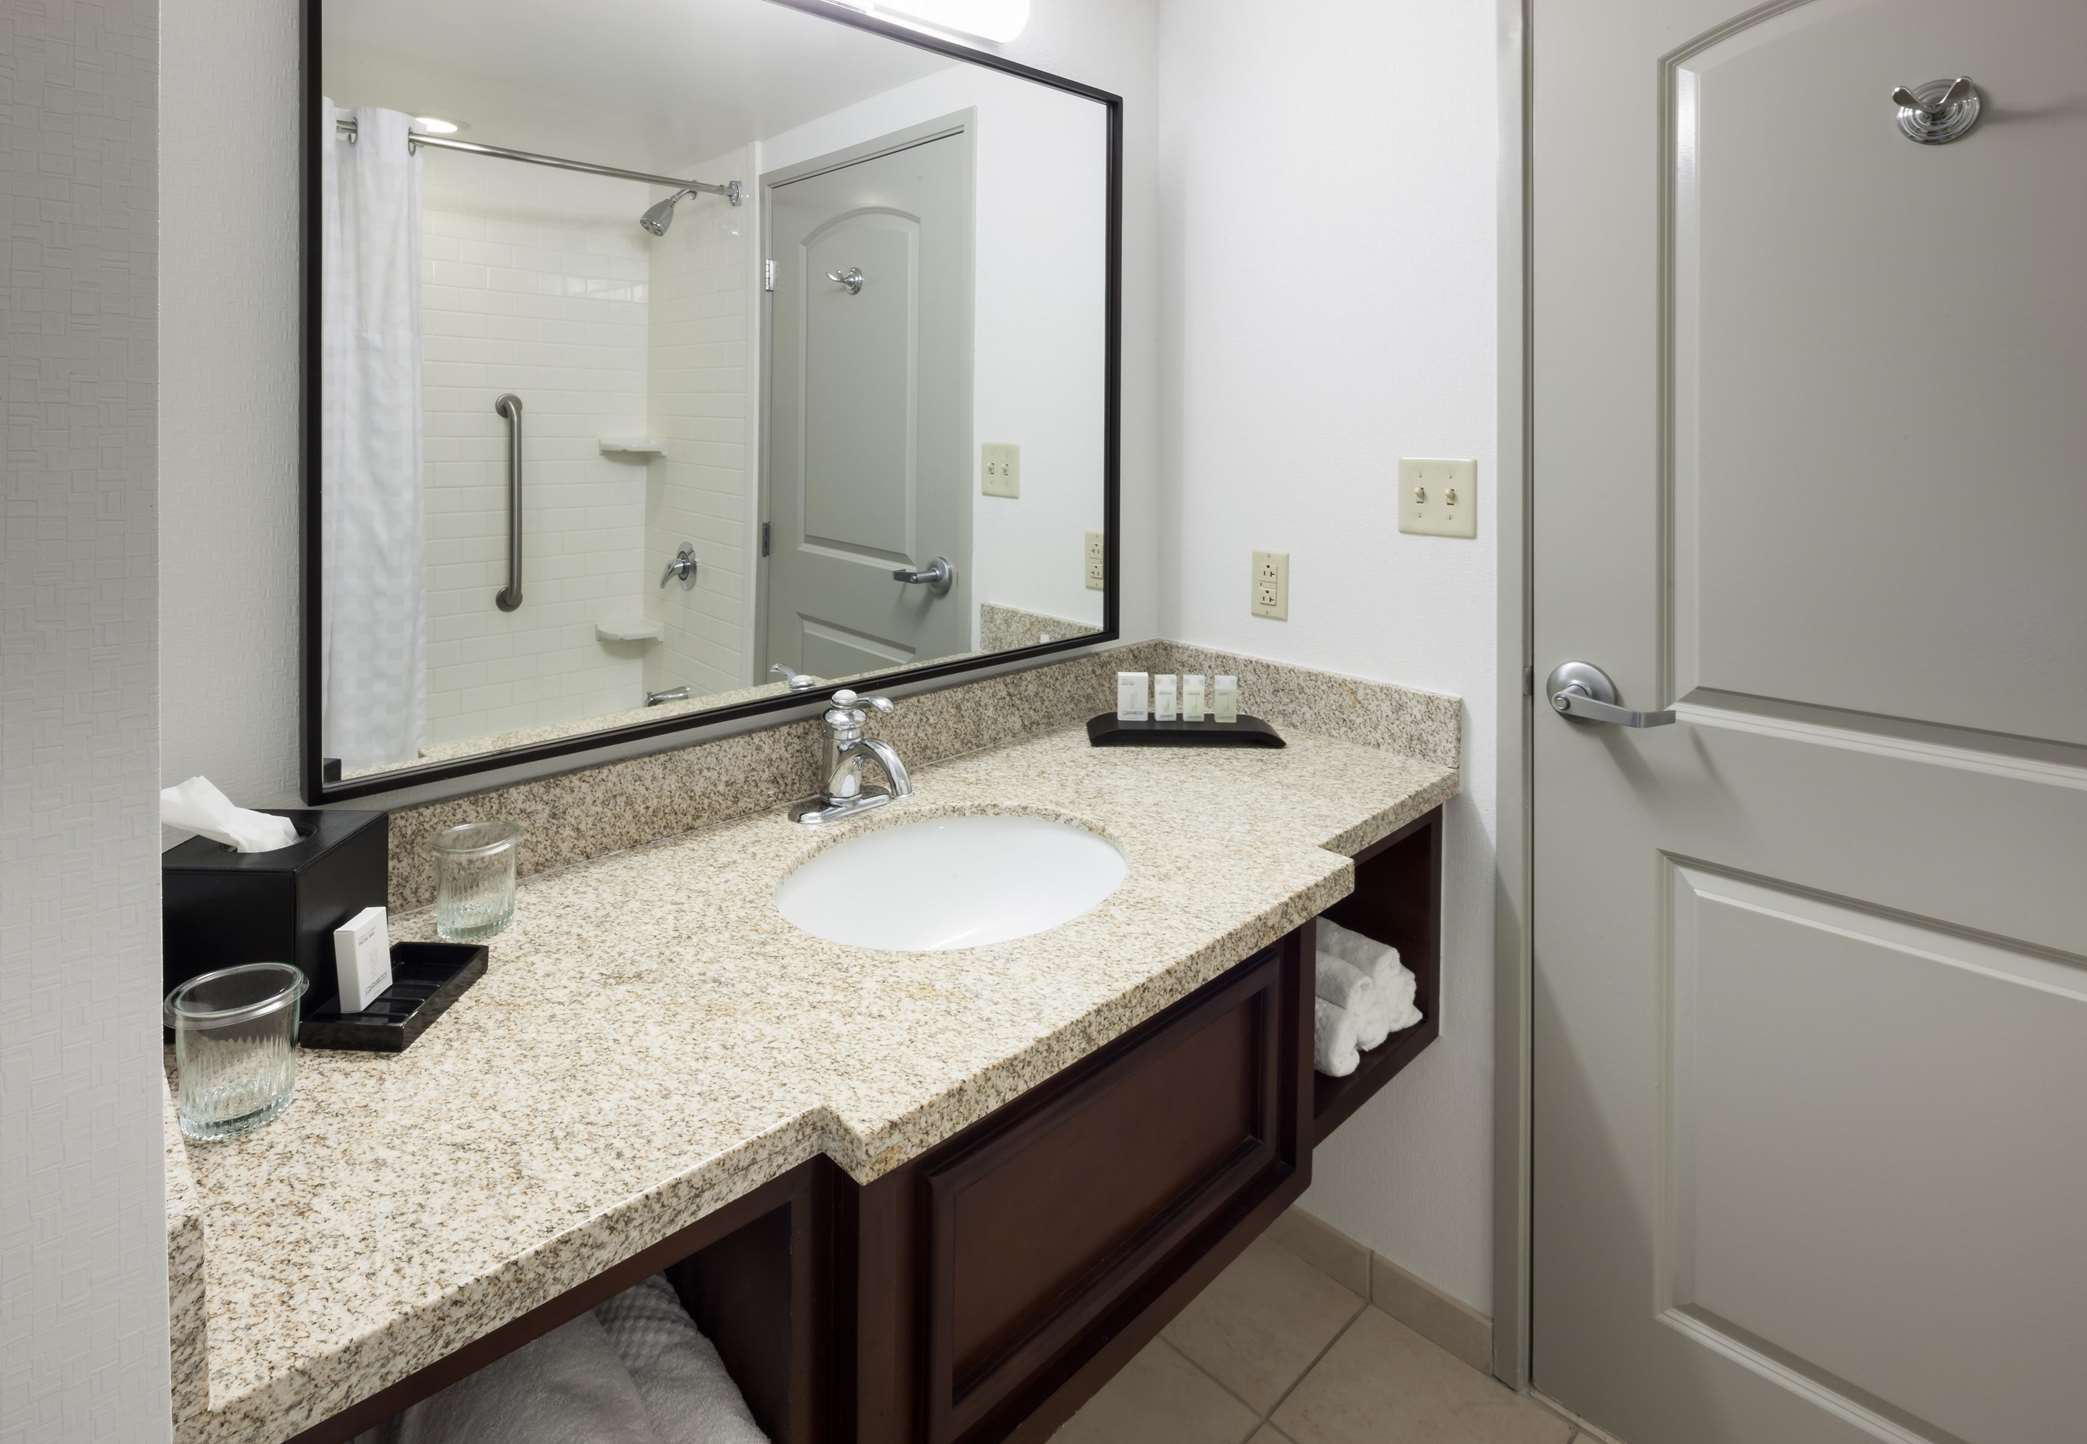 Embassy Suites by Hilton Tampa Brandon image 22